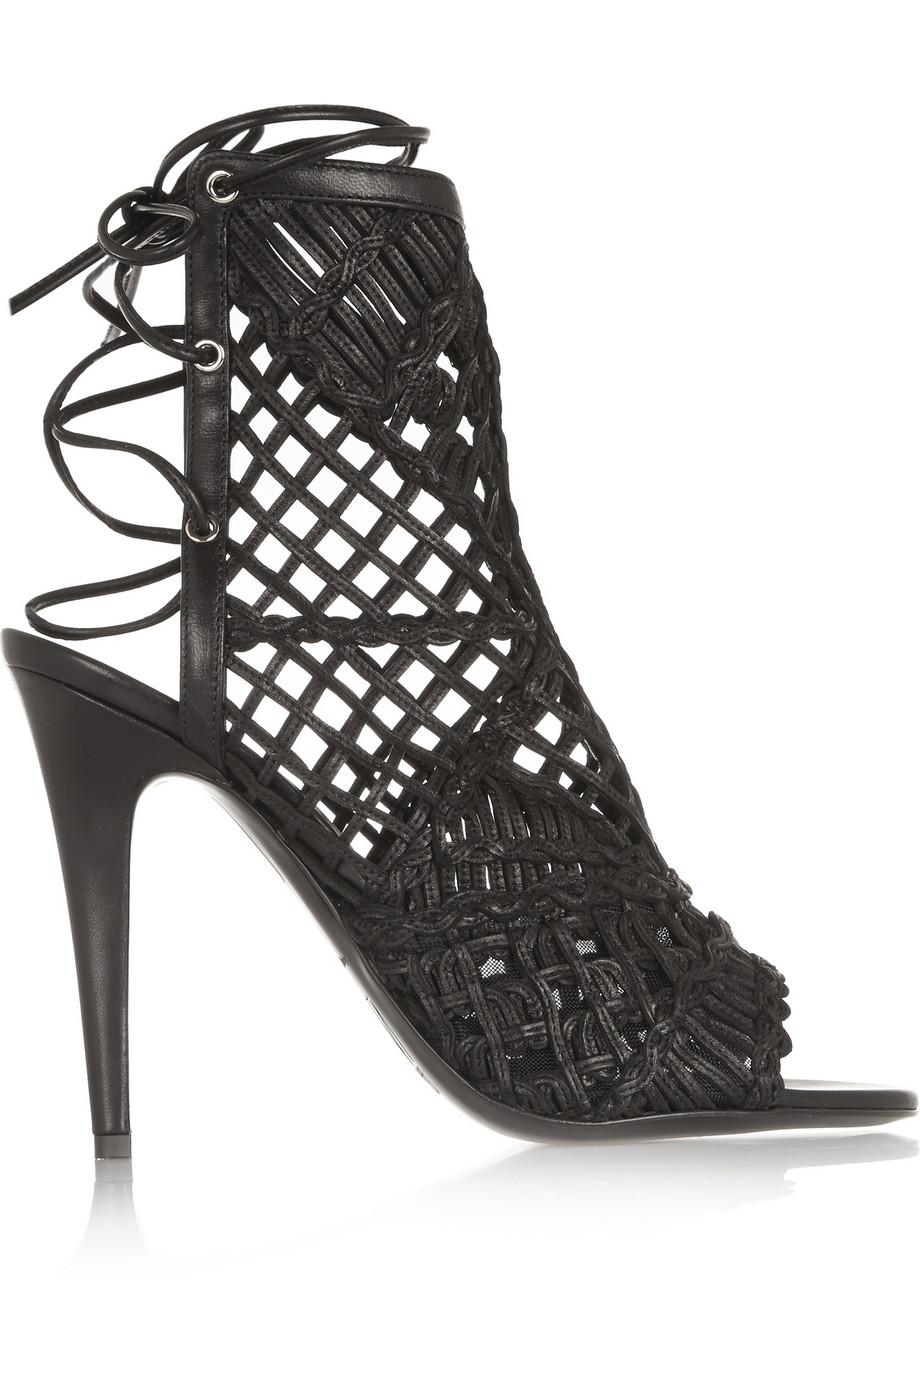 Tamara Mellon Black Widow Macramé Sandals $597.50